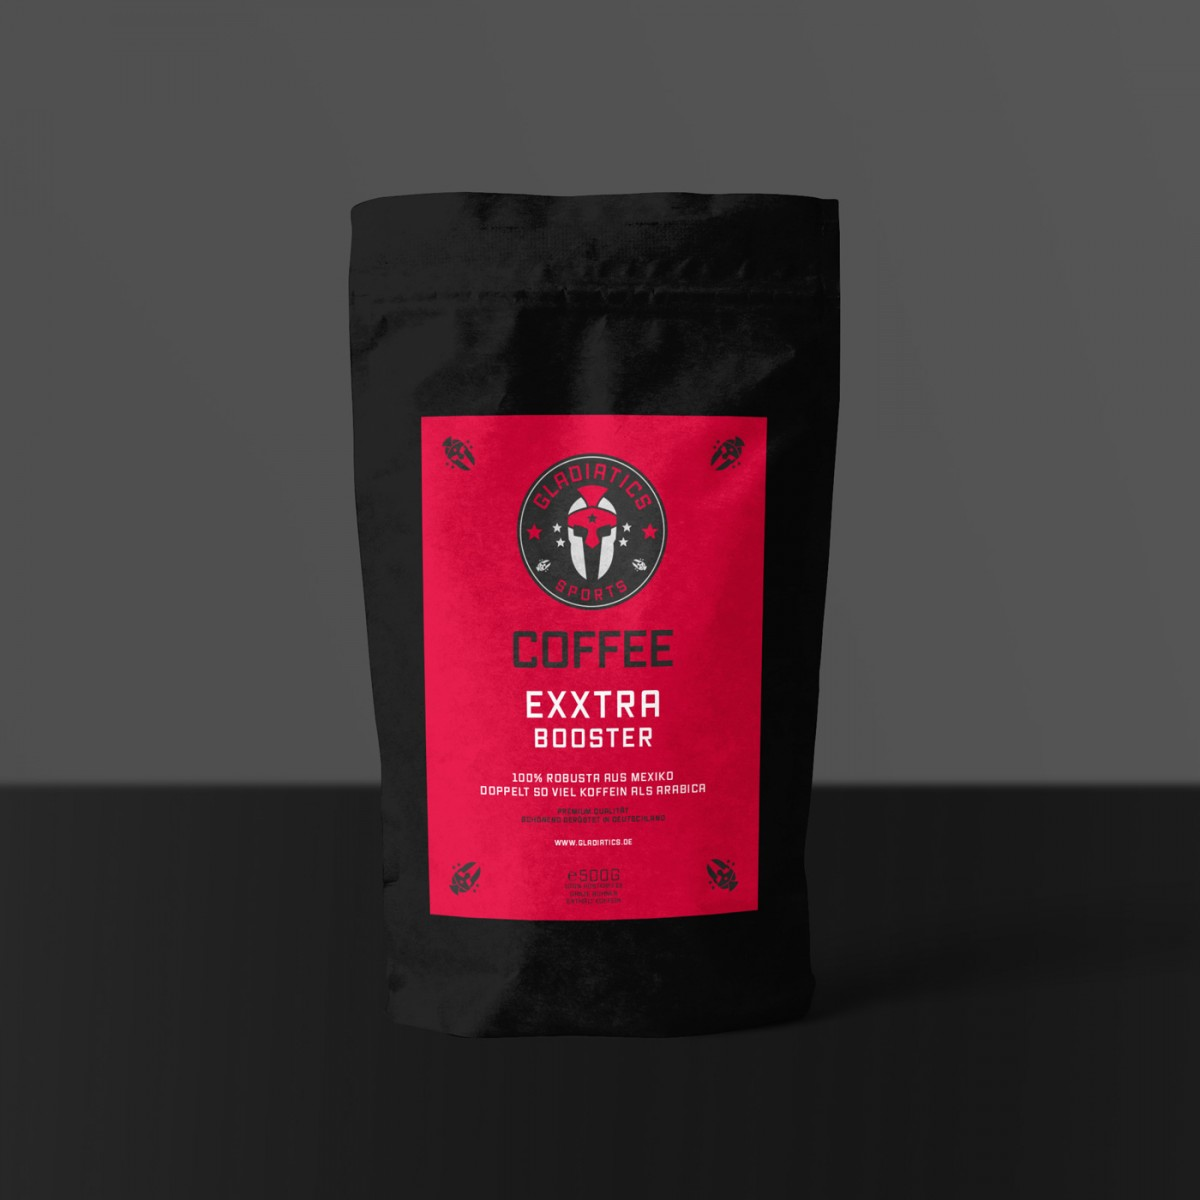 GLADIATICS Coffee - Extra starker Kaffee